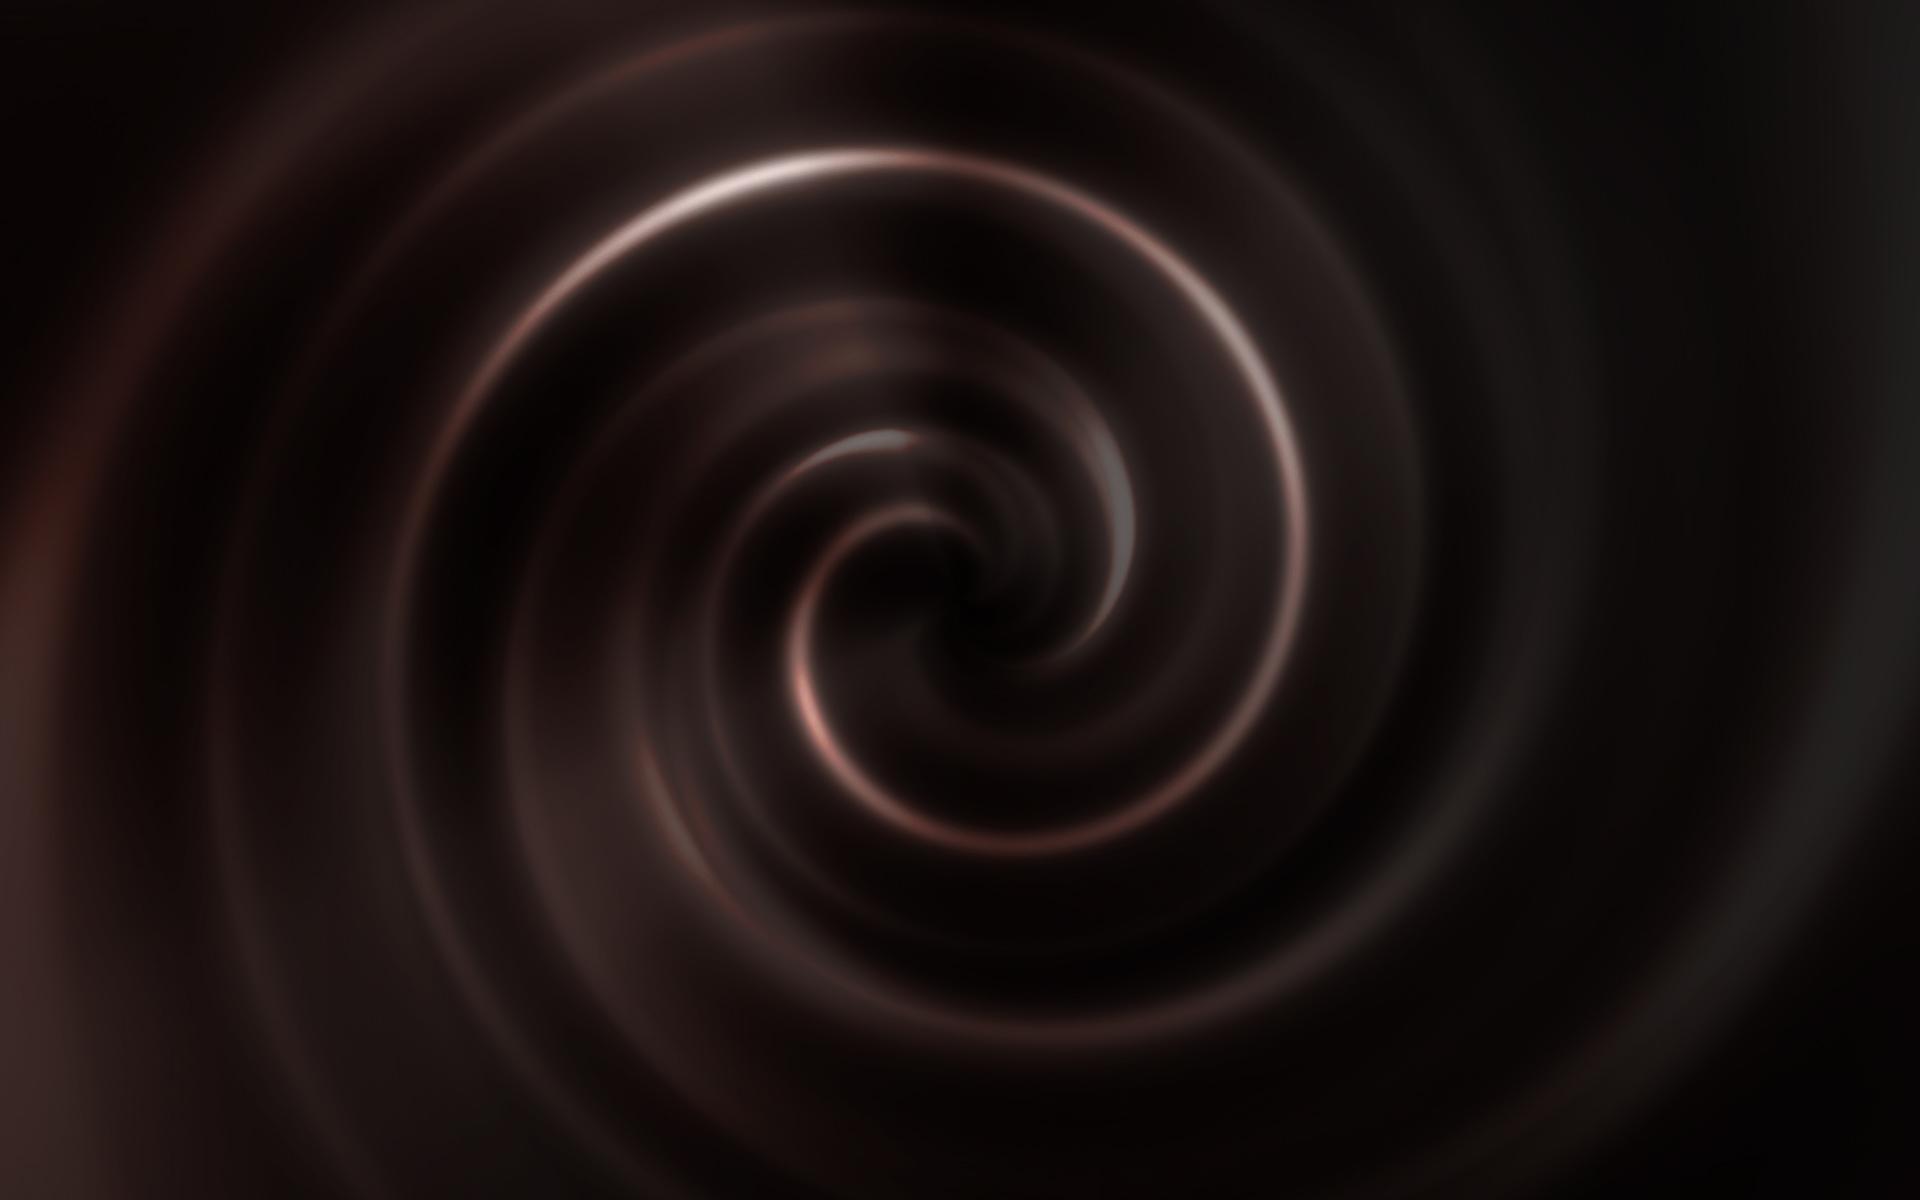 Hot Chocolate wallpaper   353939 1920x1200